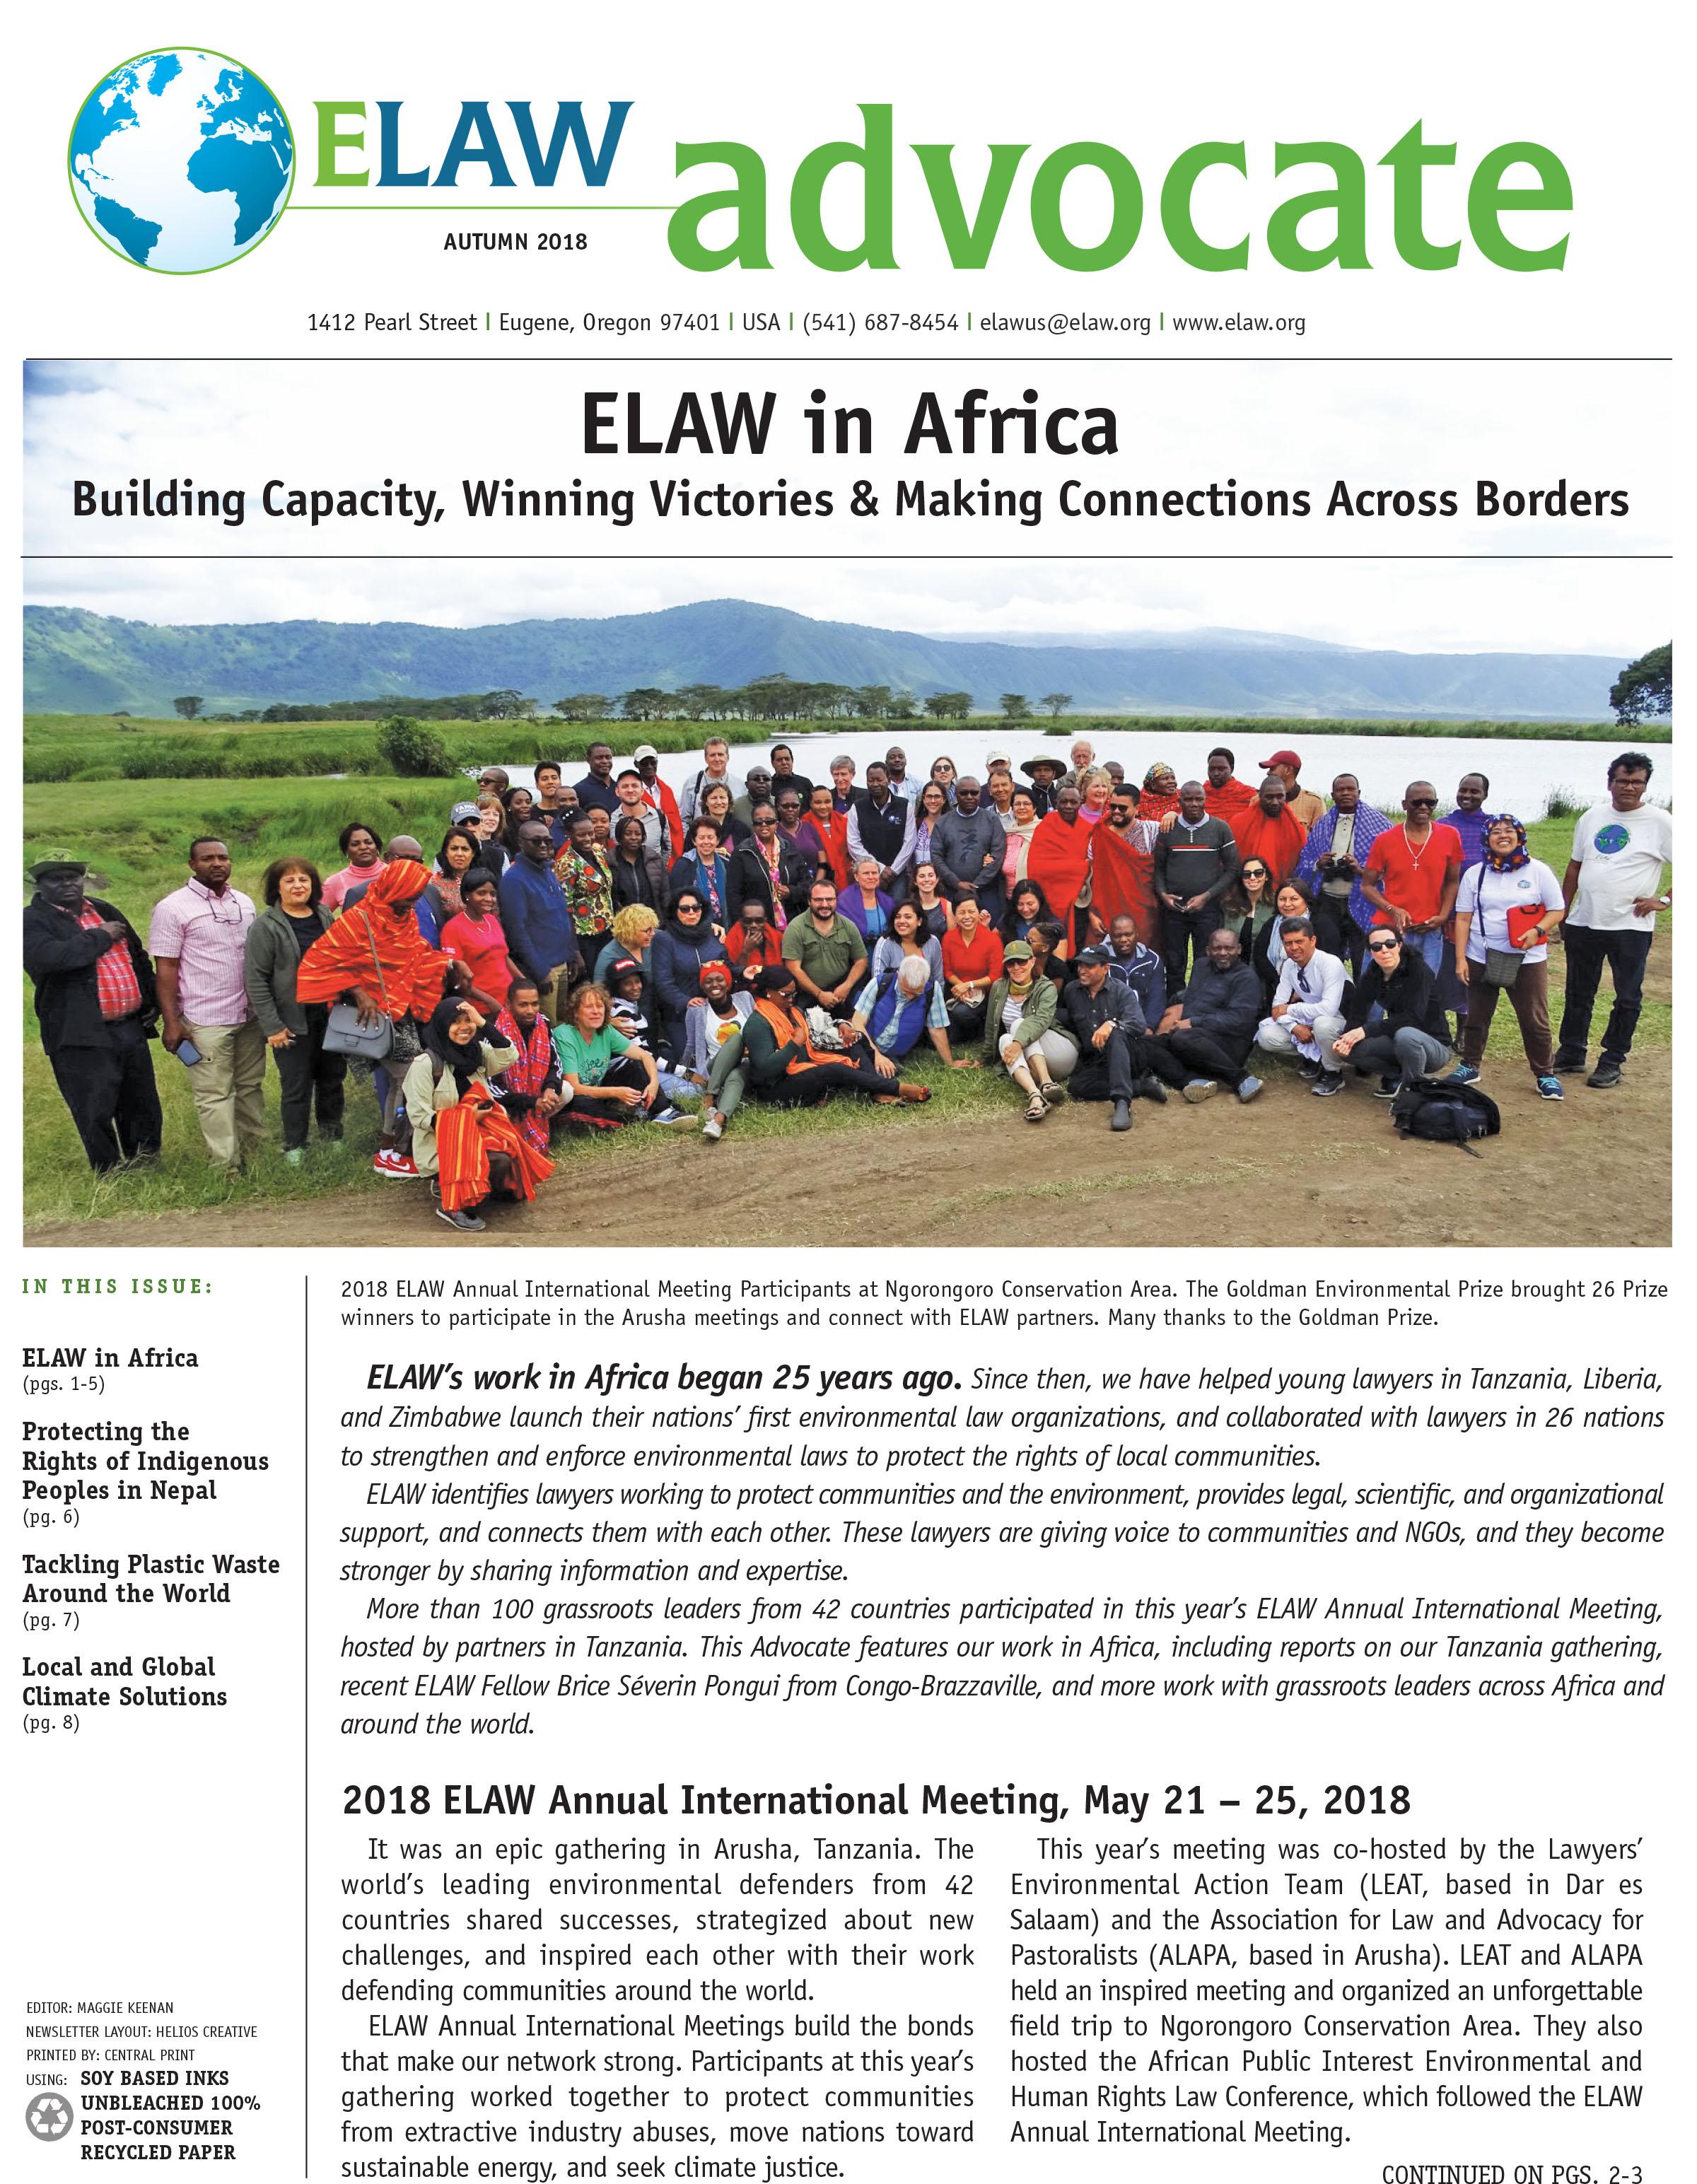 ELAW 2018 Advocate